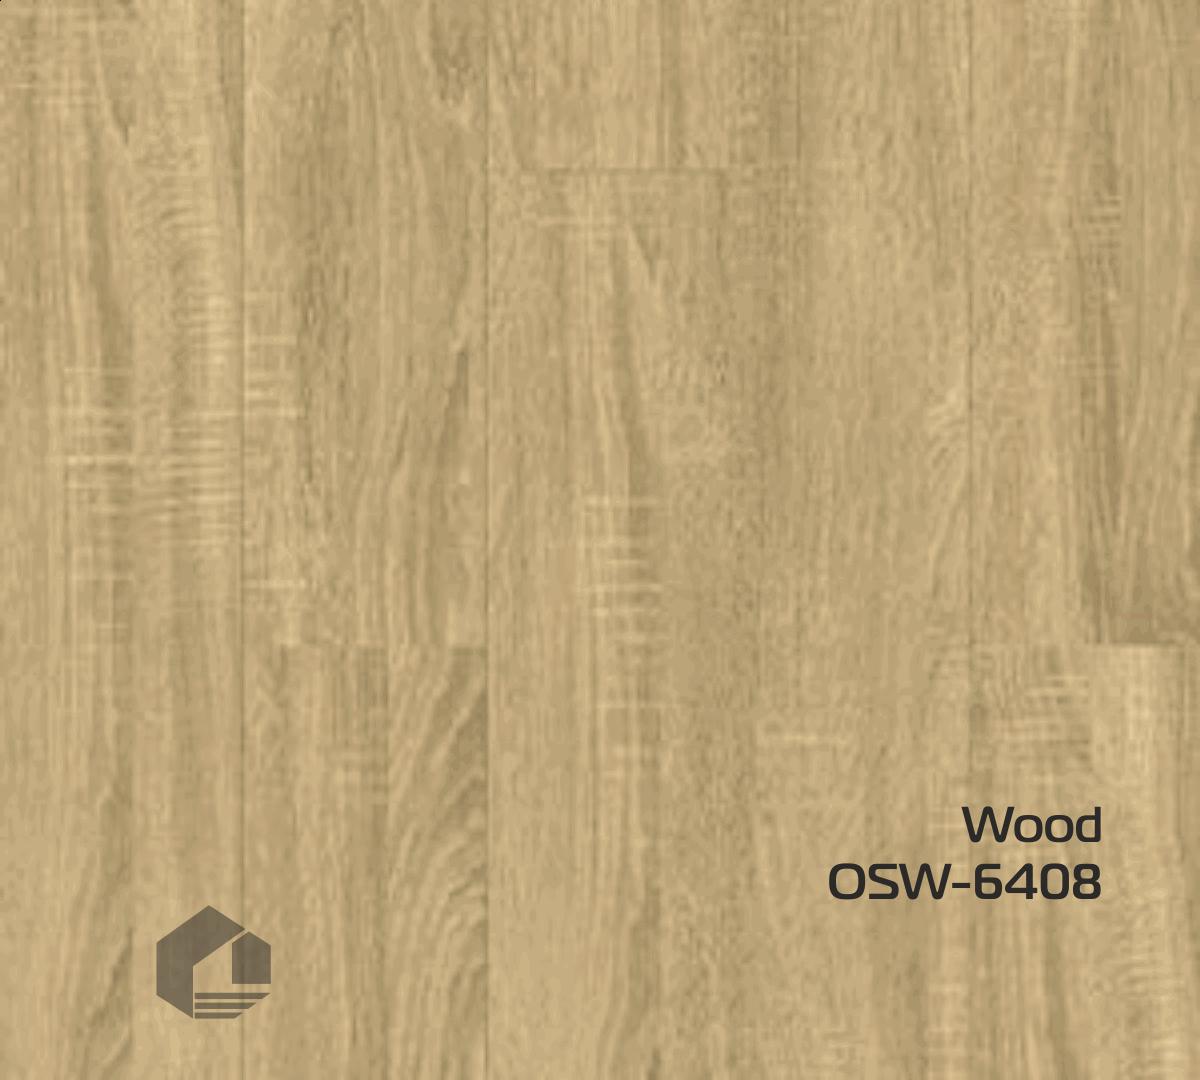 Кварцвиниловая плитка Orchid Tile Wood OSW-6408 (186*940*3 мм.) 19шт/3,32м2